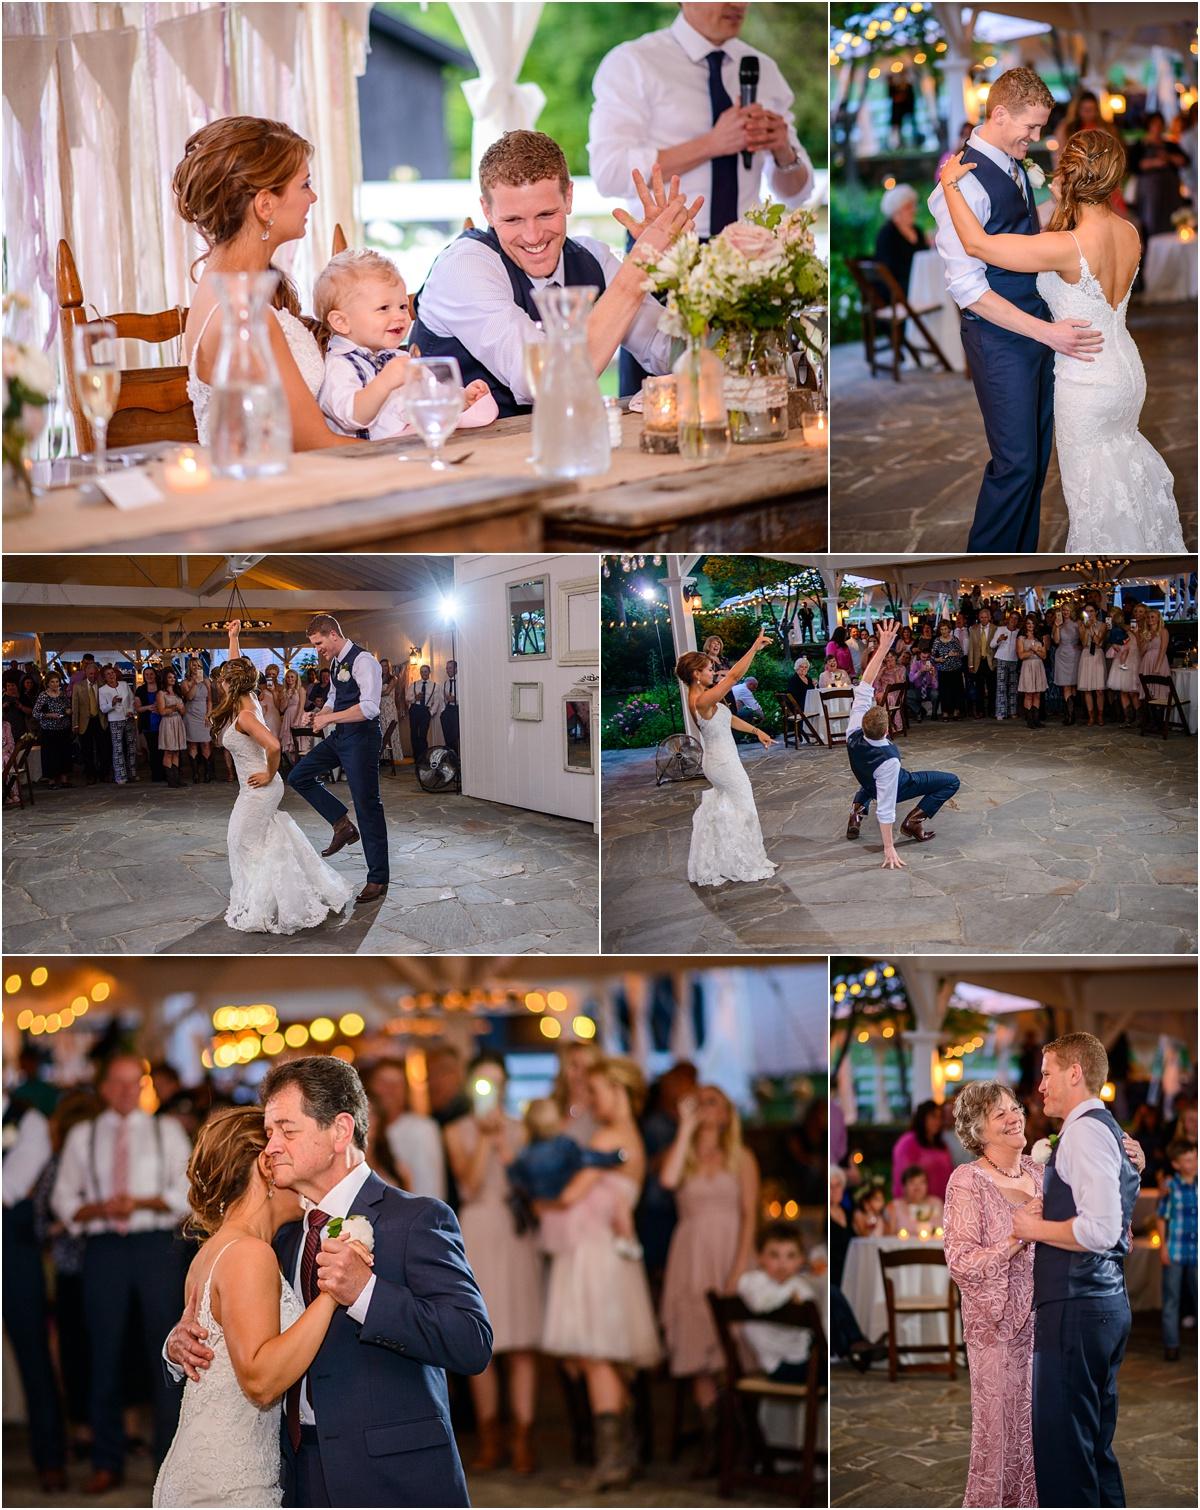 Greg Smit Photography Nashville wedding photographer Cedarwood Weddings_0055